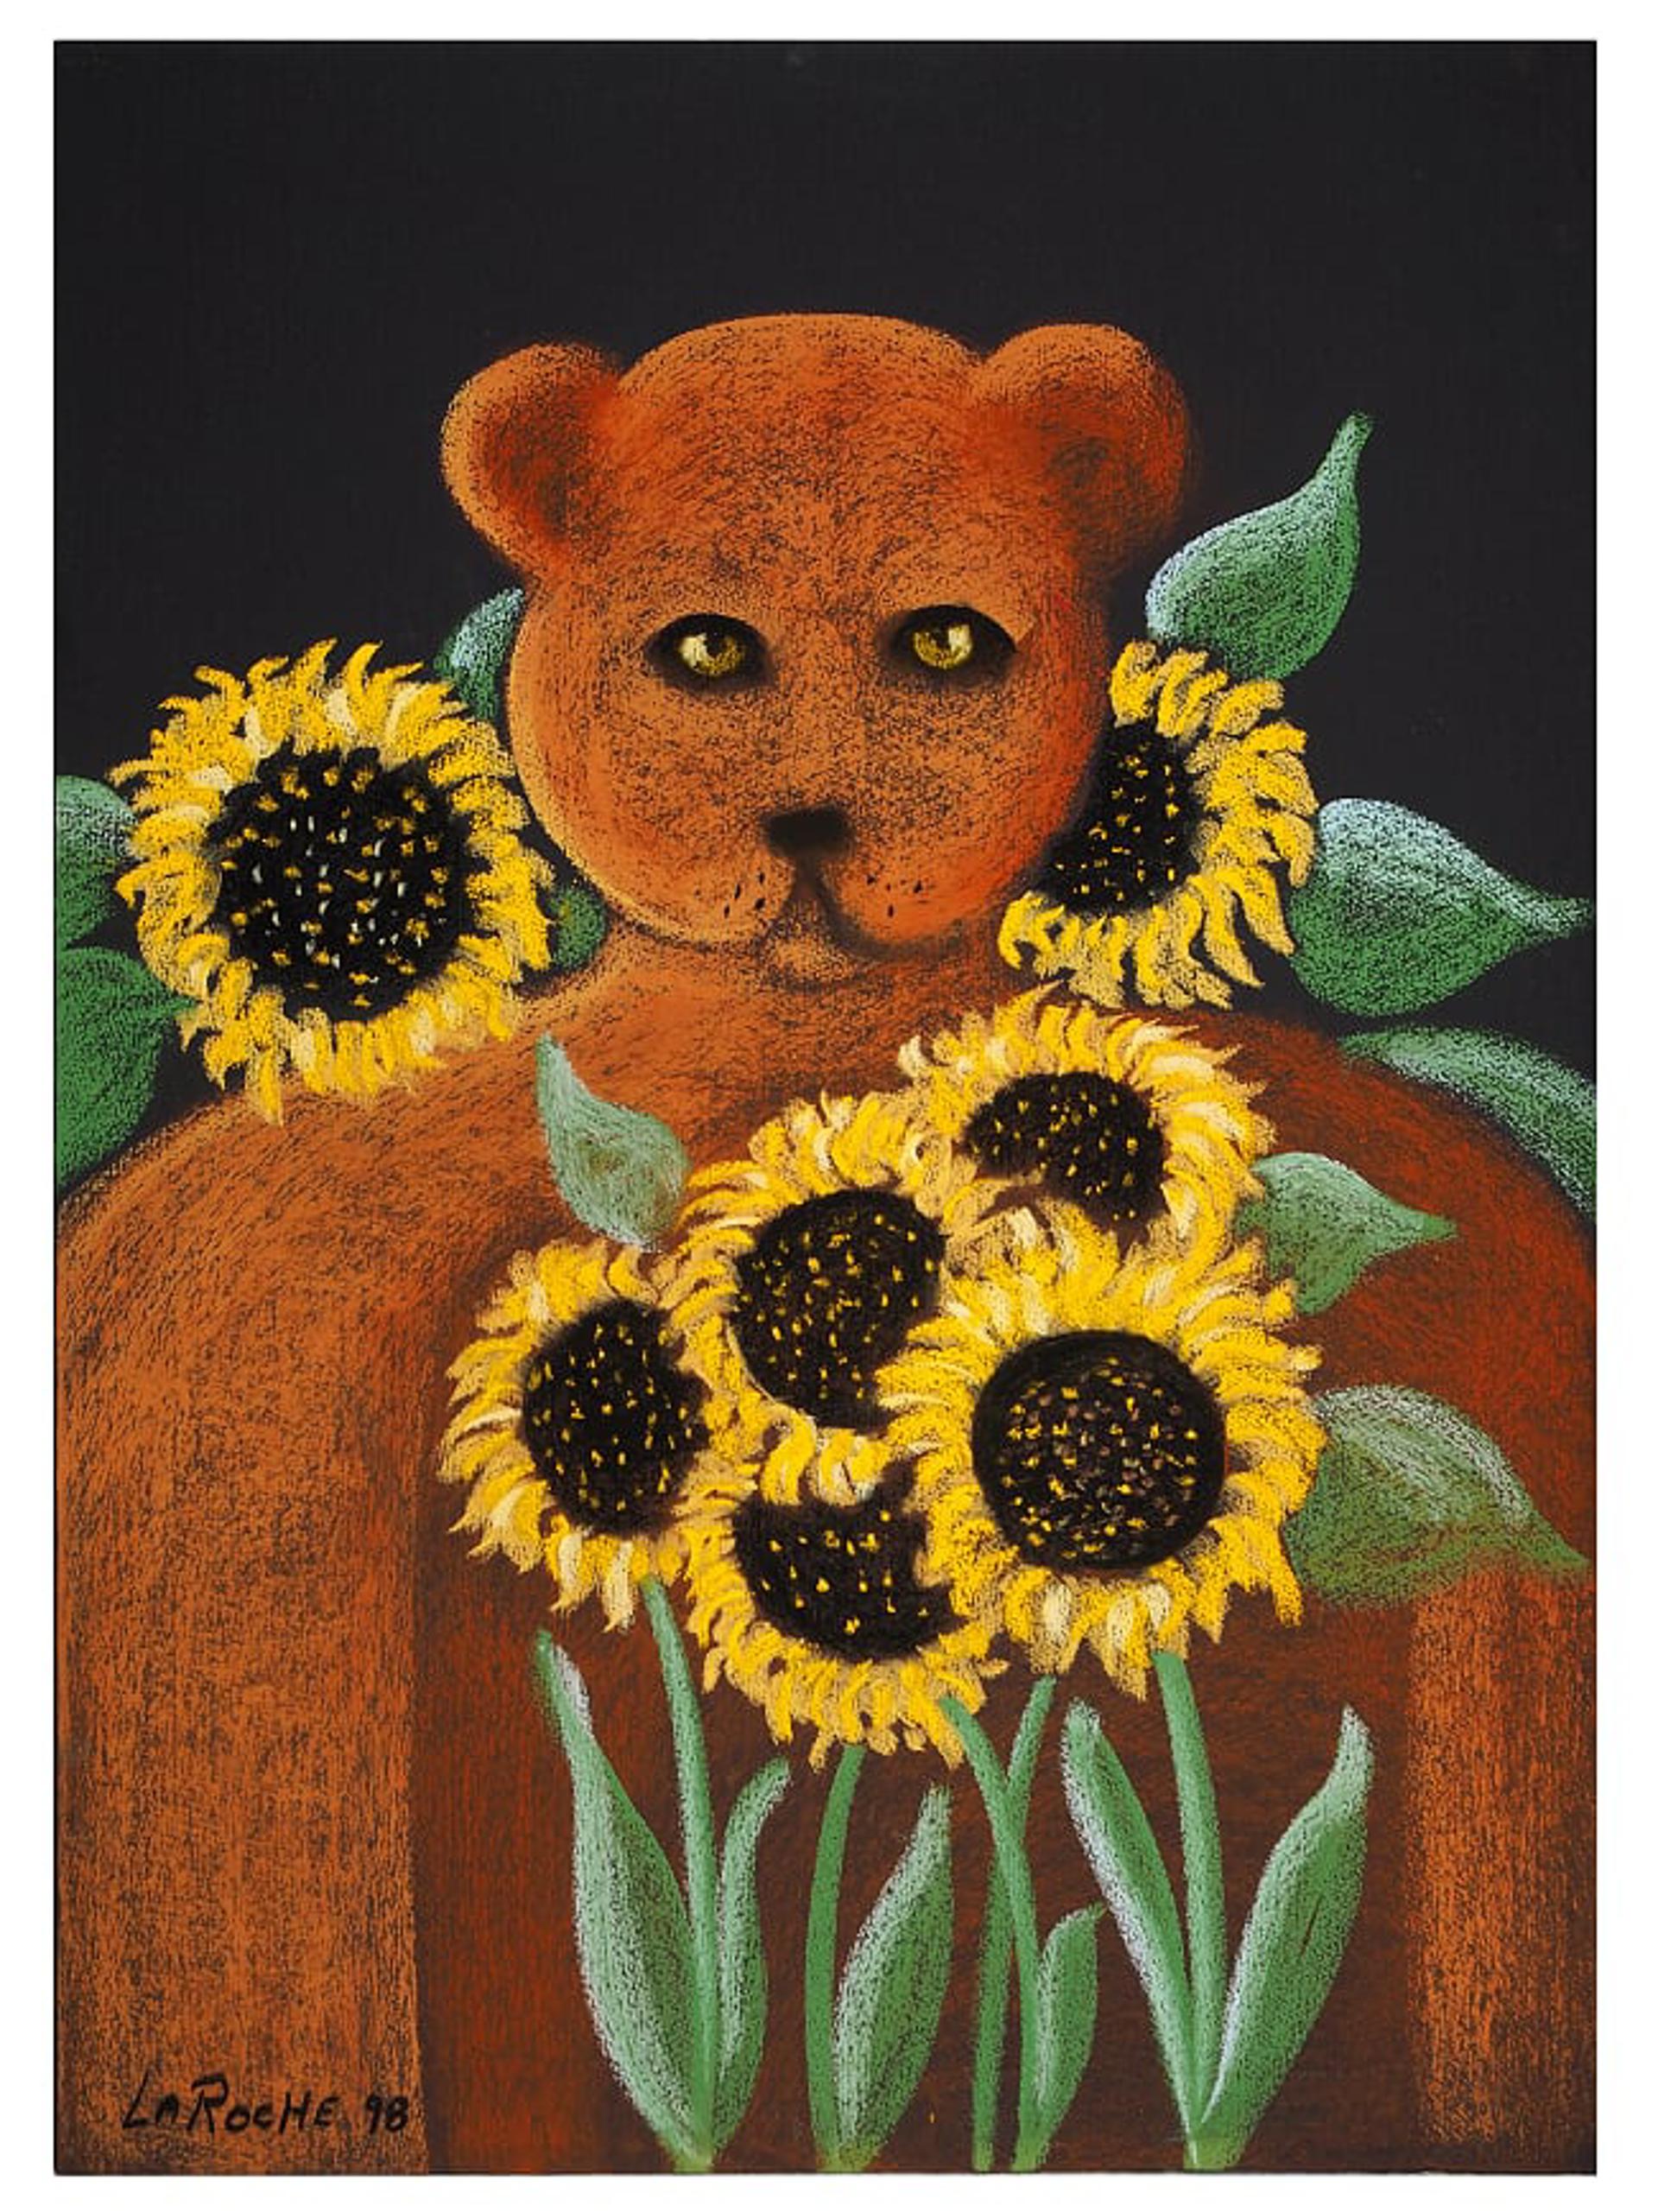 BEAR WITH SUNFLOWERS by Carole LaRoche